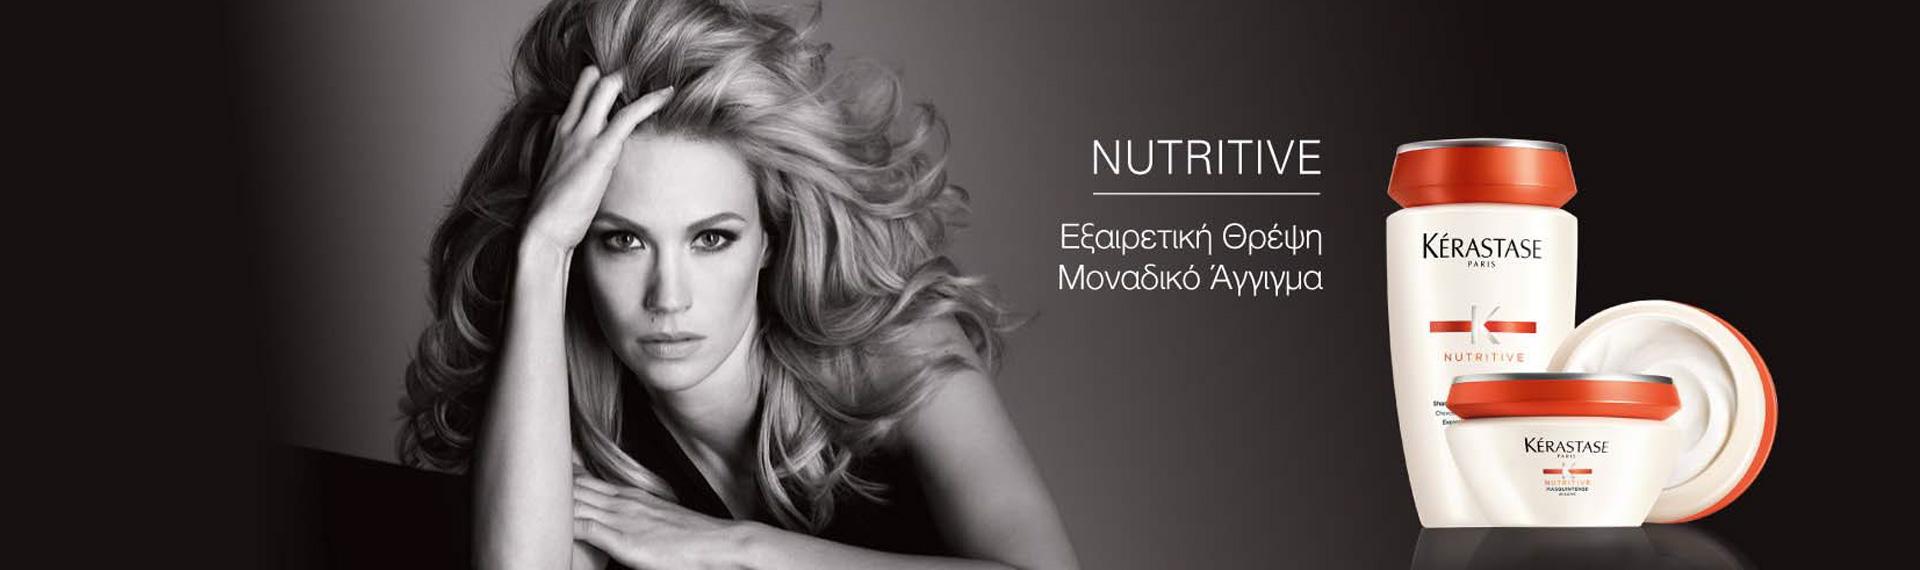 Kerastase-Nutritive